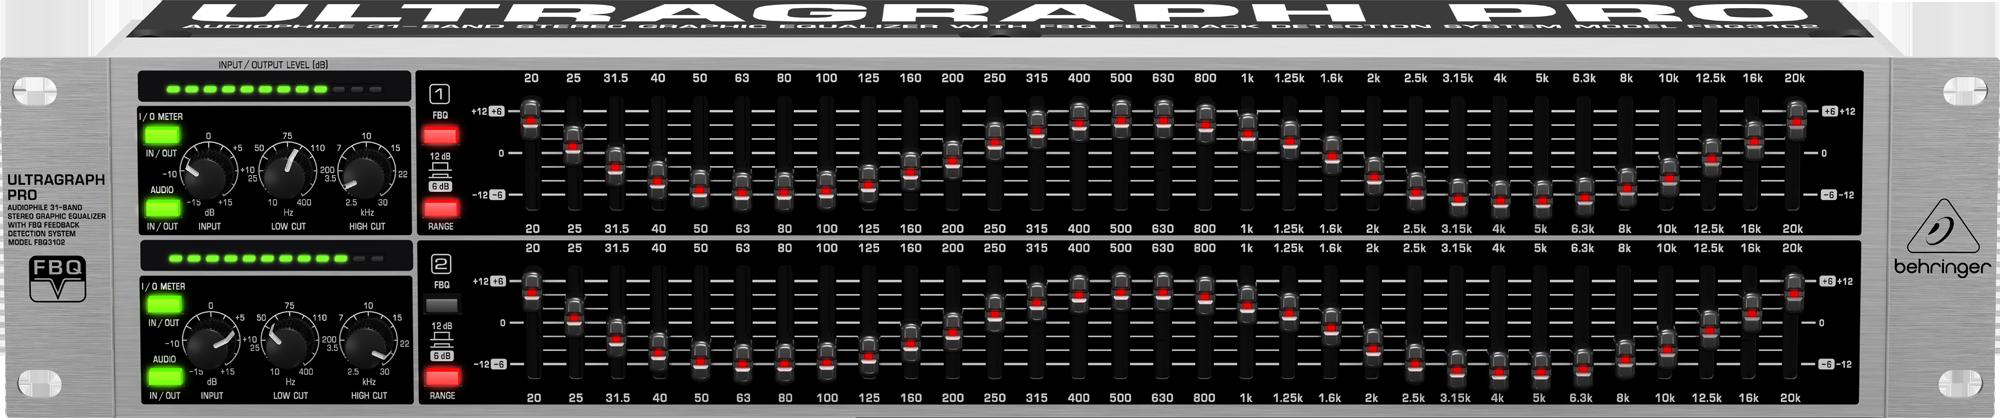 behringer ultragraph pro fbq3102 manual